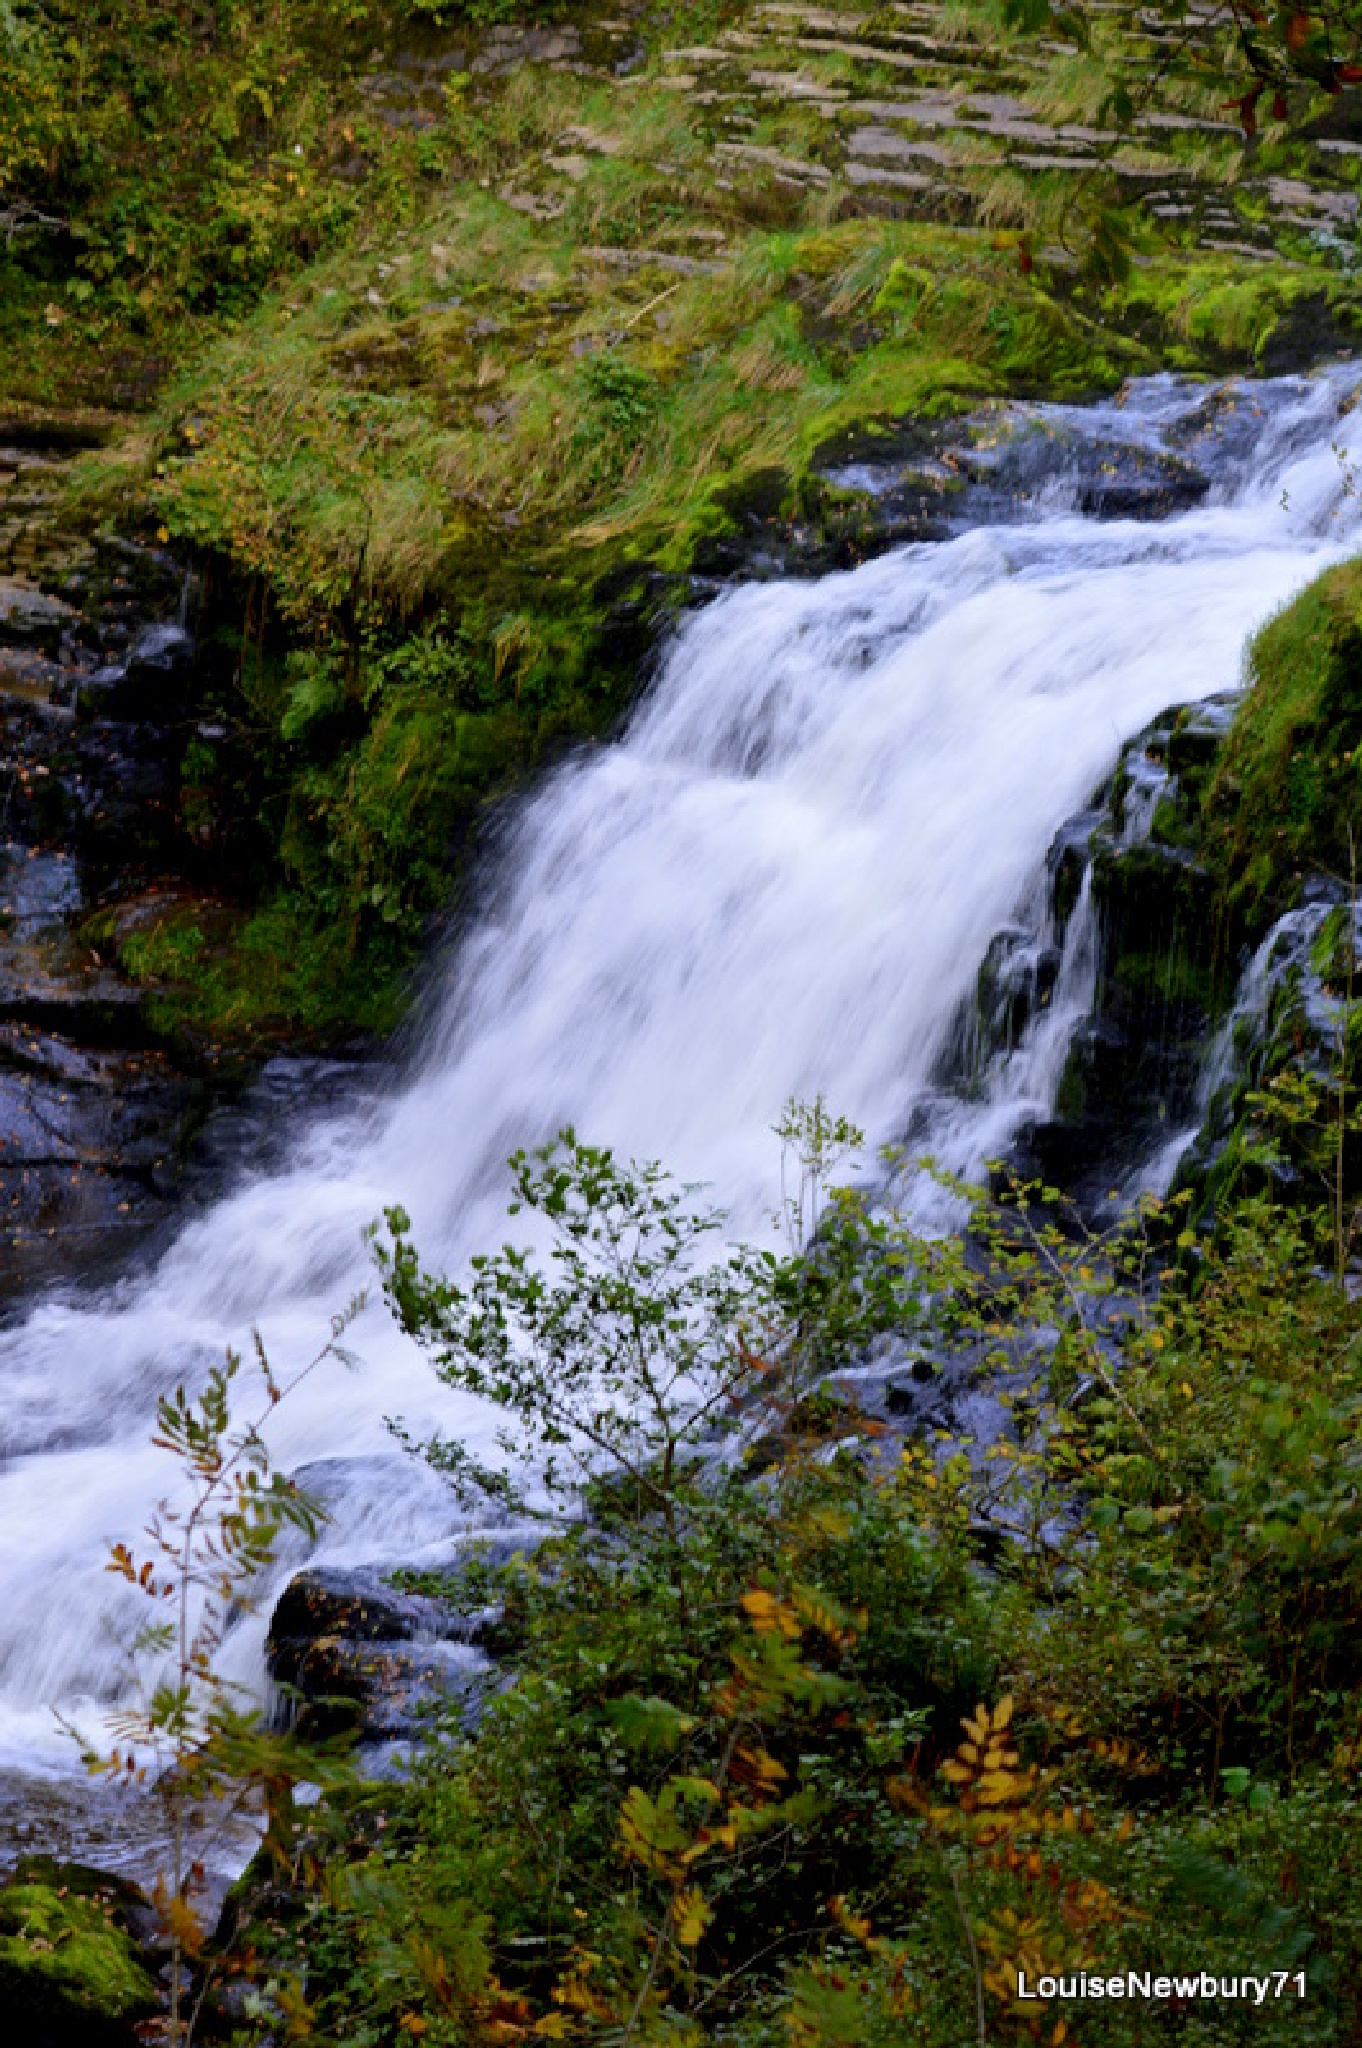 2nd waterfall @ Ystradfellte by louise.newbury